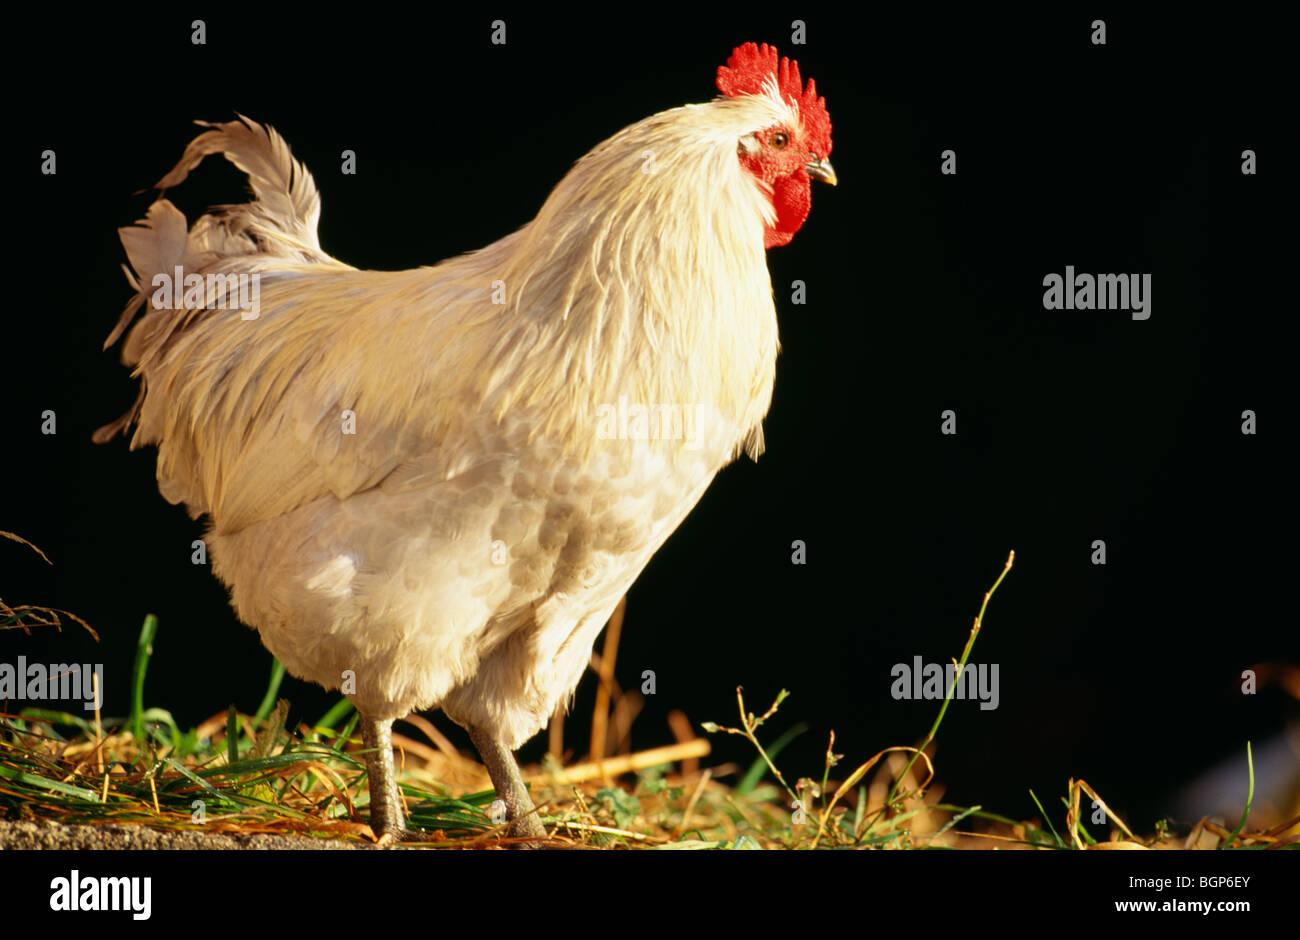 A hen, Sweden. - Stock Image